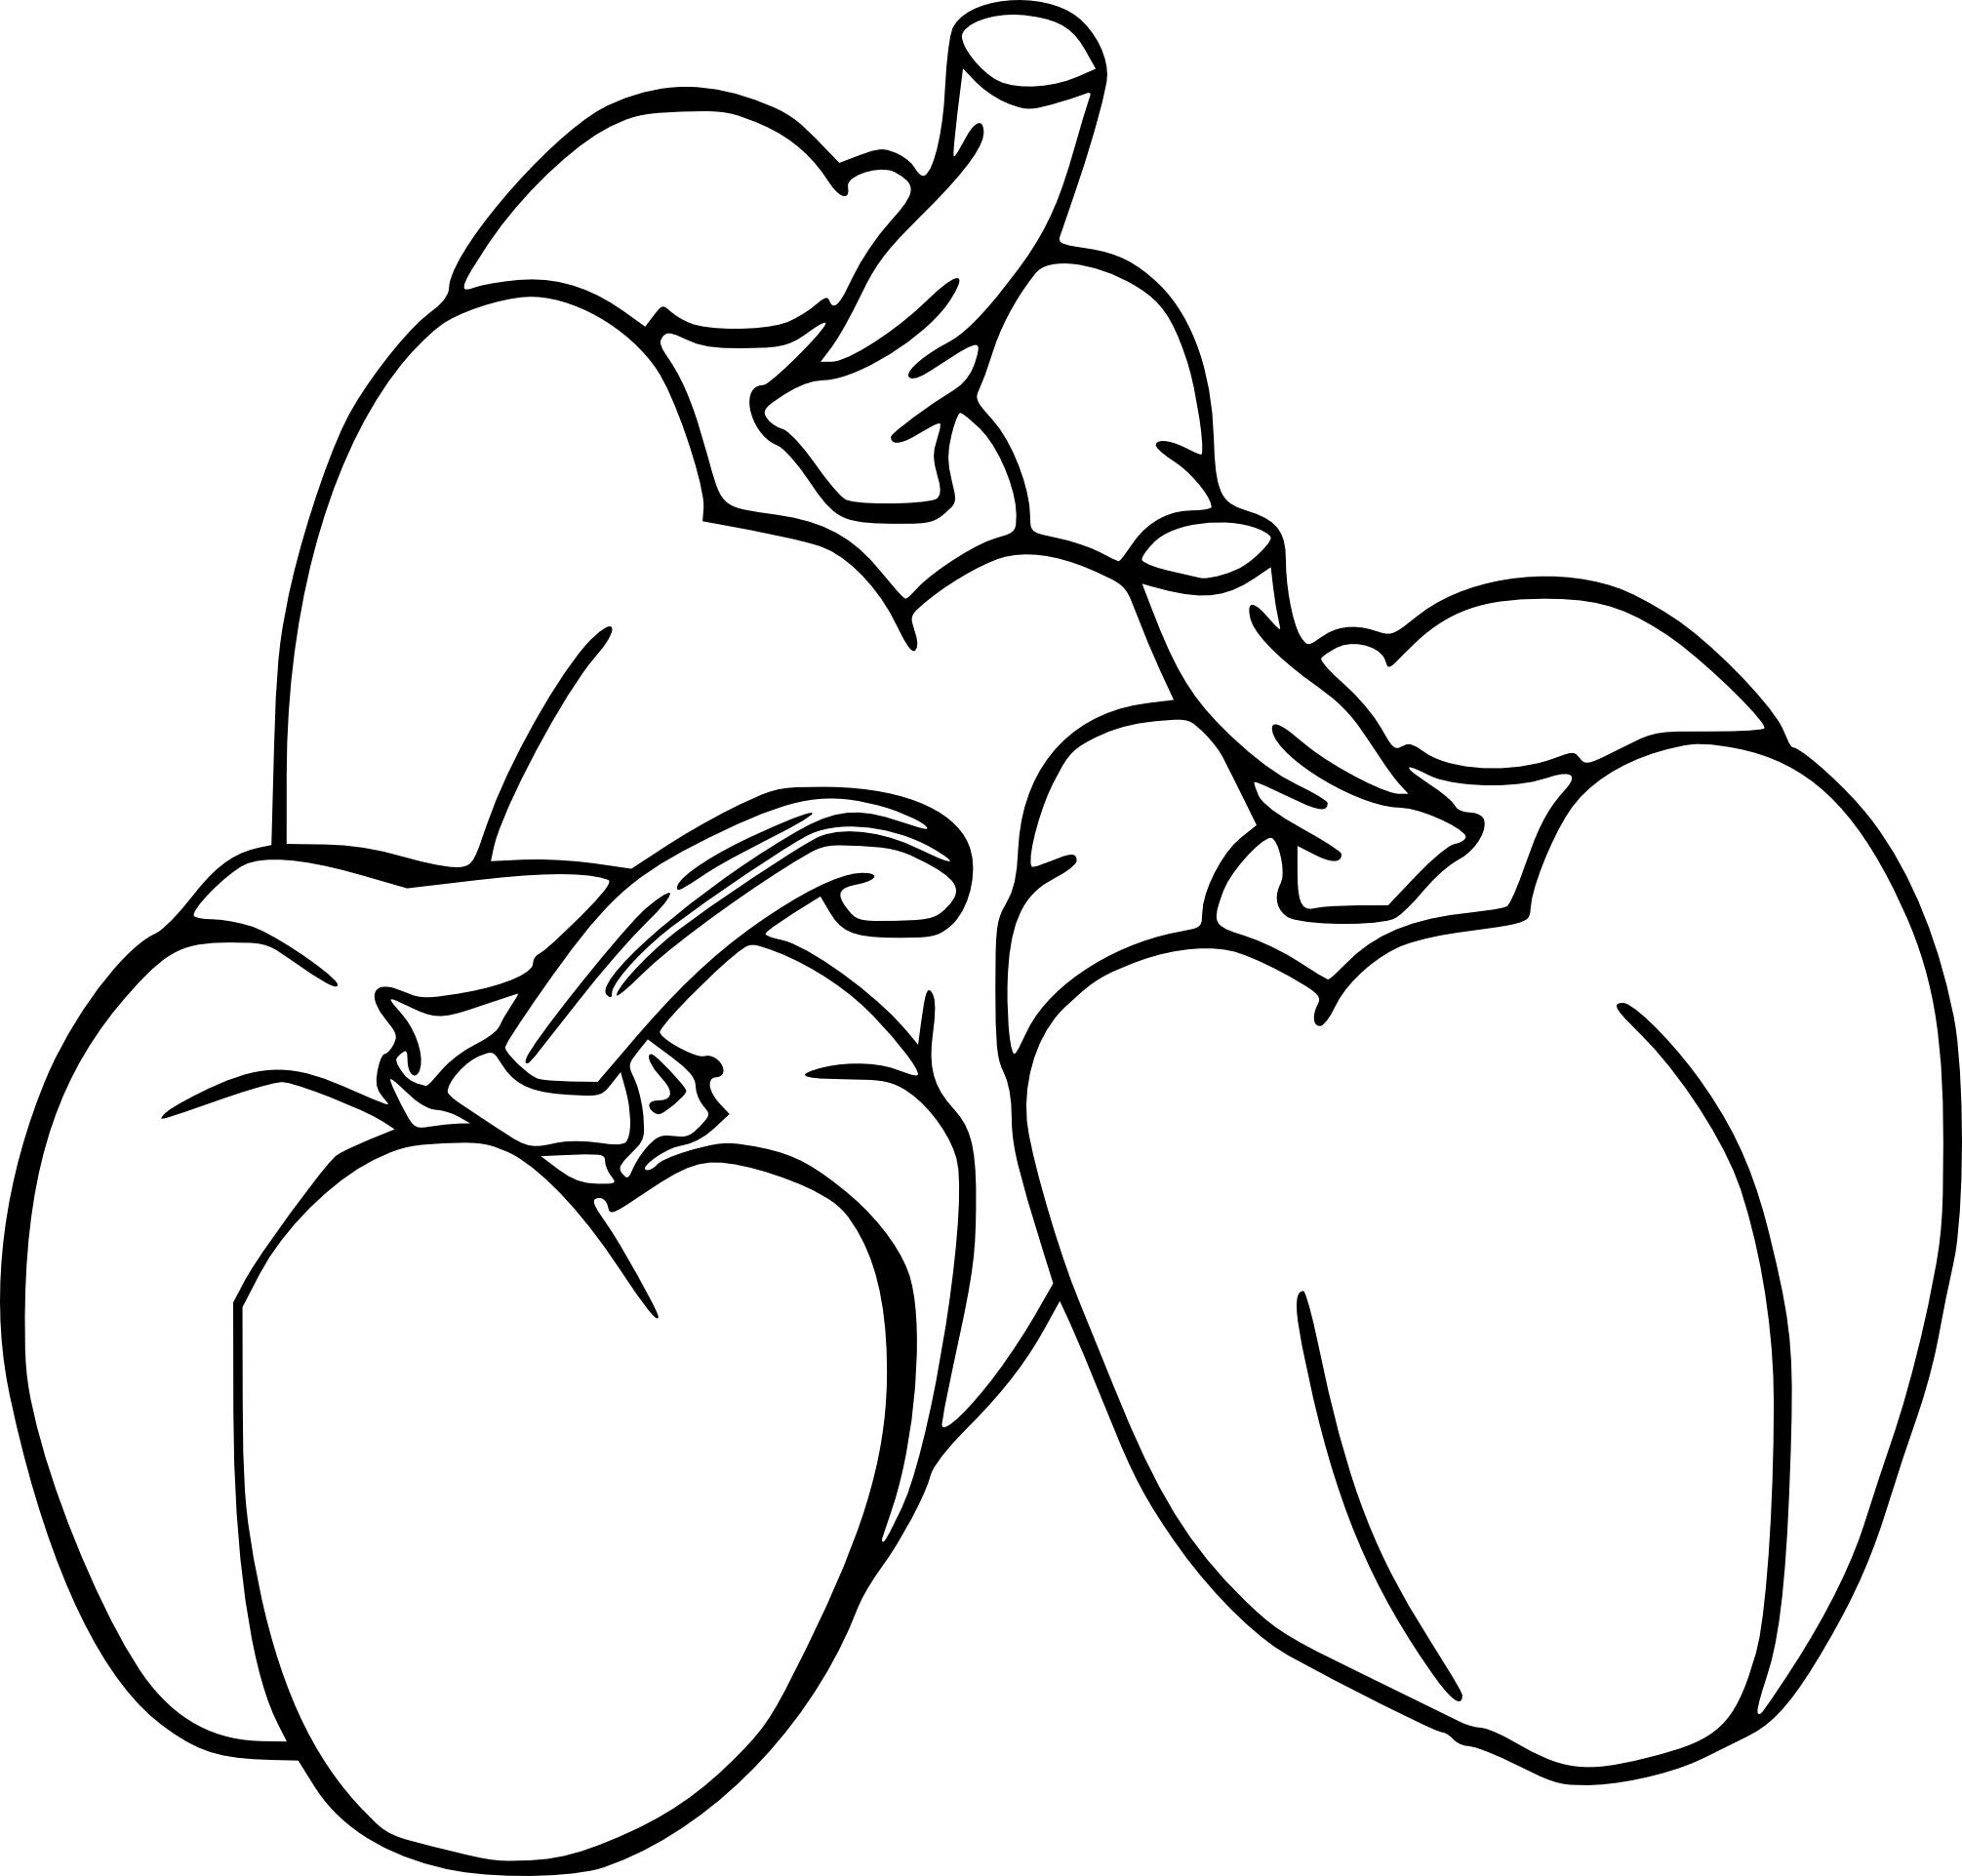 Coloriage poivron